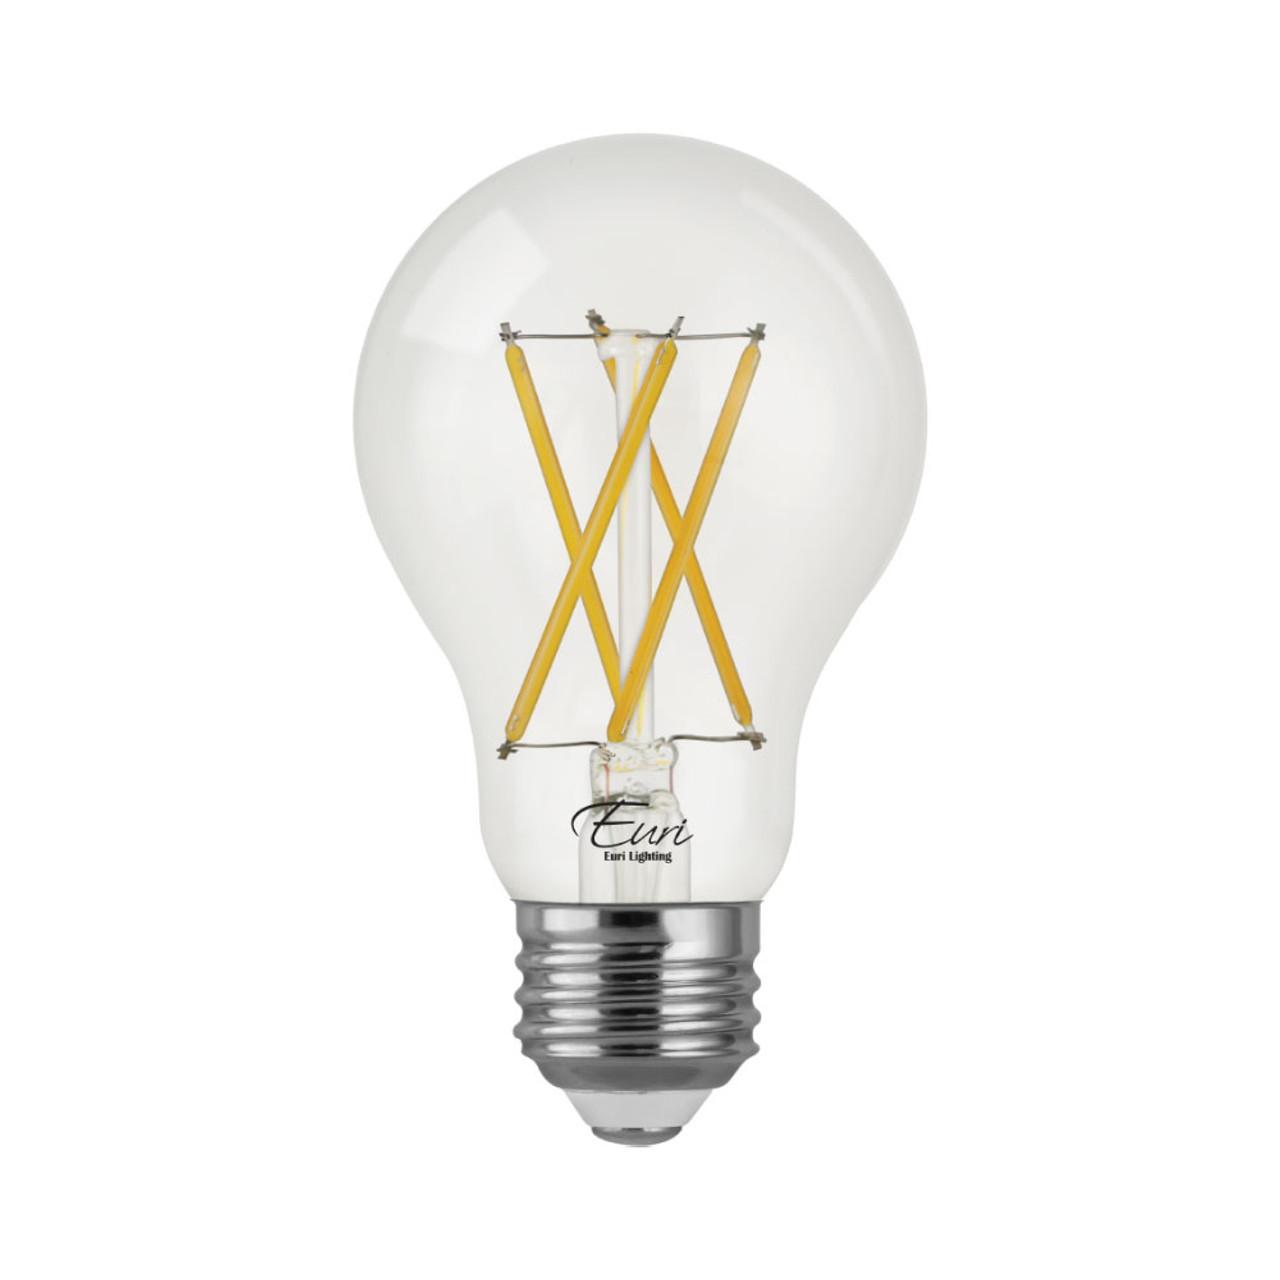 A19, Omni-Directional, LED Light Bulb, Dimmable, 8.5 W, 120 V, 800 lm, 3000 K, E26 Base (VA19-3000cec)